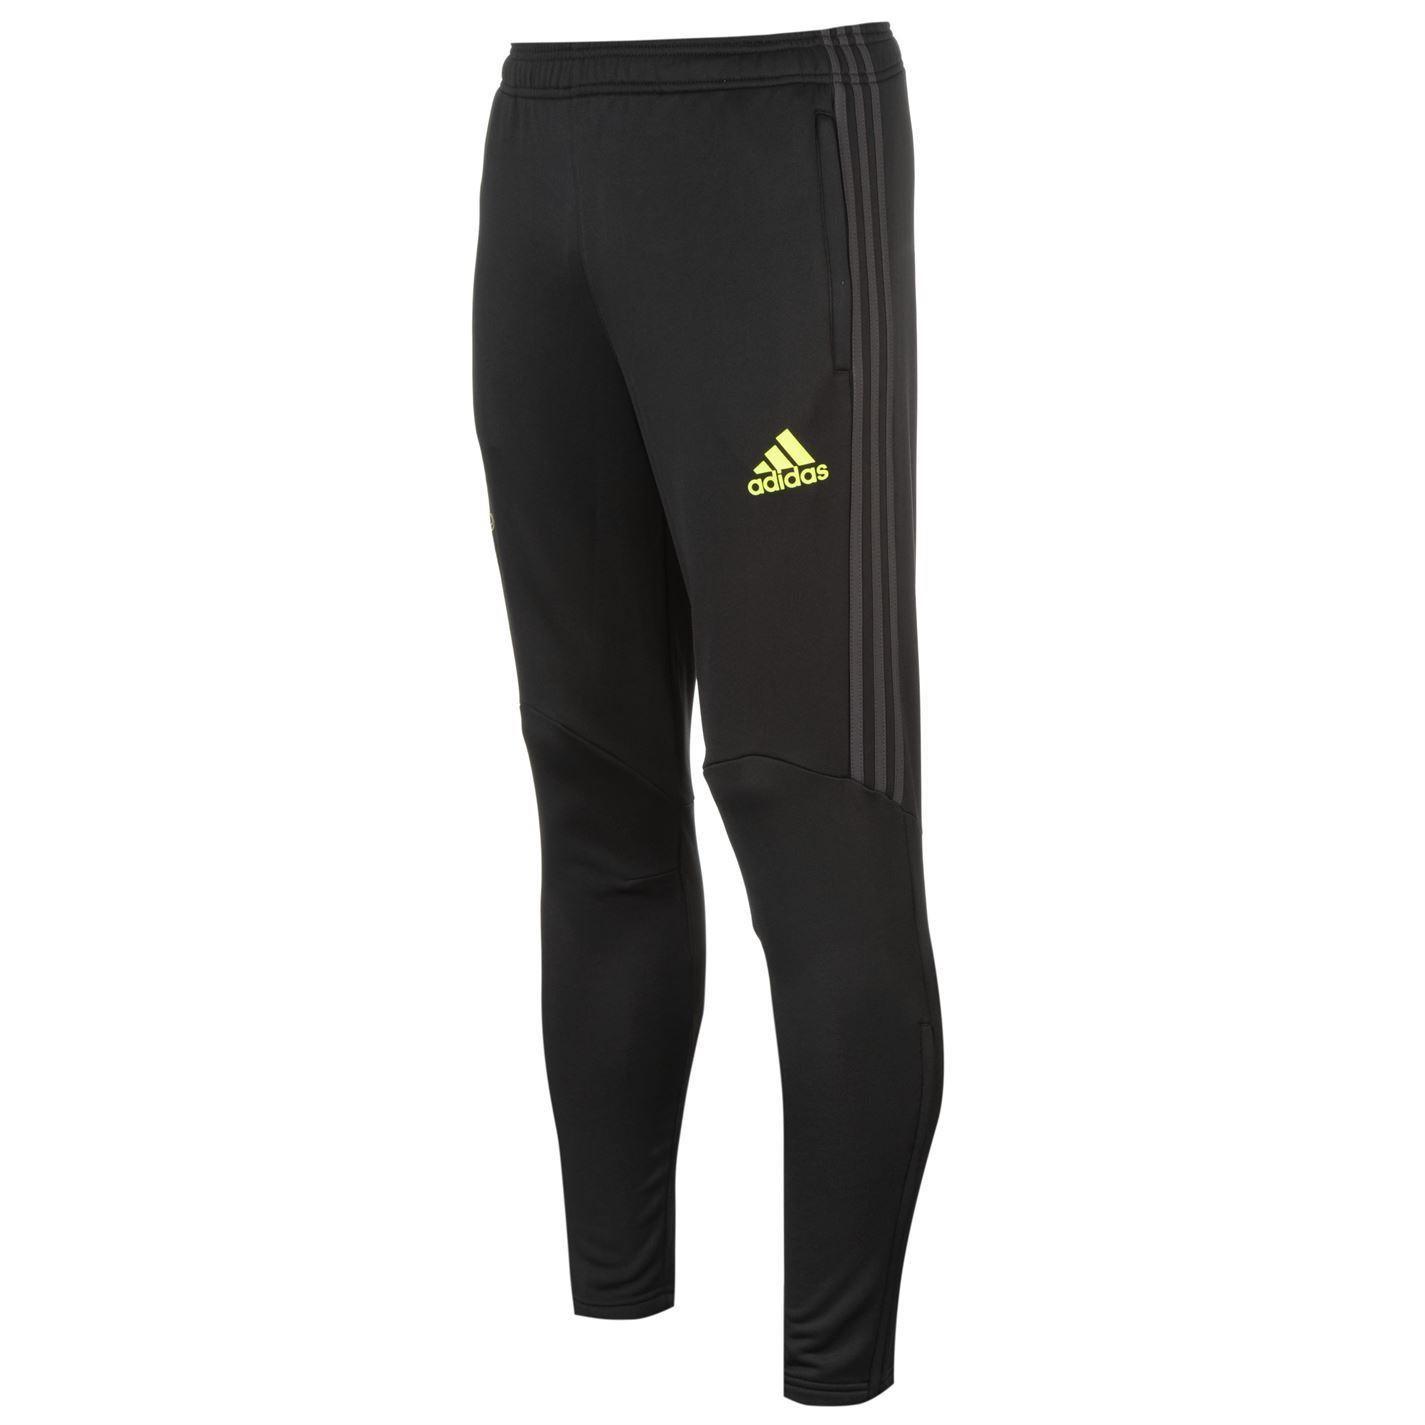 Adidas Chelsea Pre Match Track Pants Mens Black Yellow Football